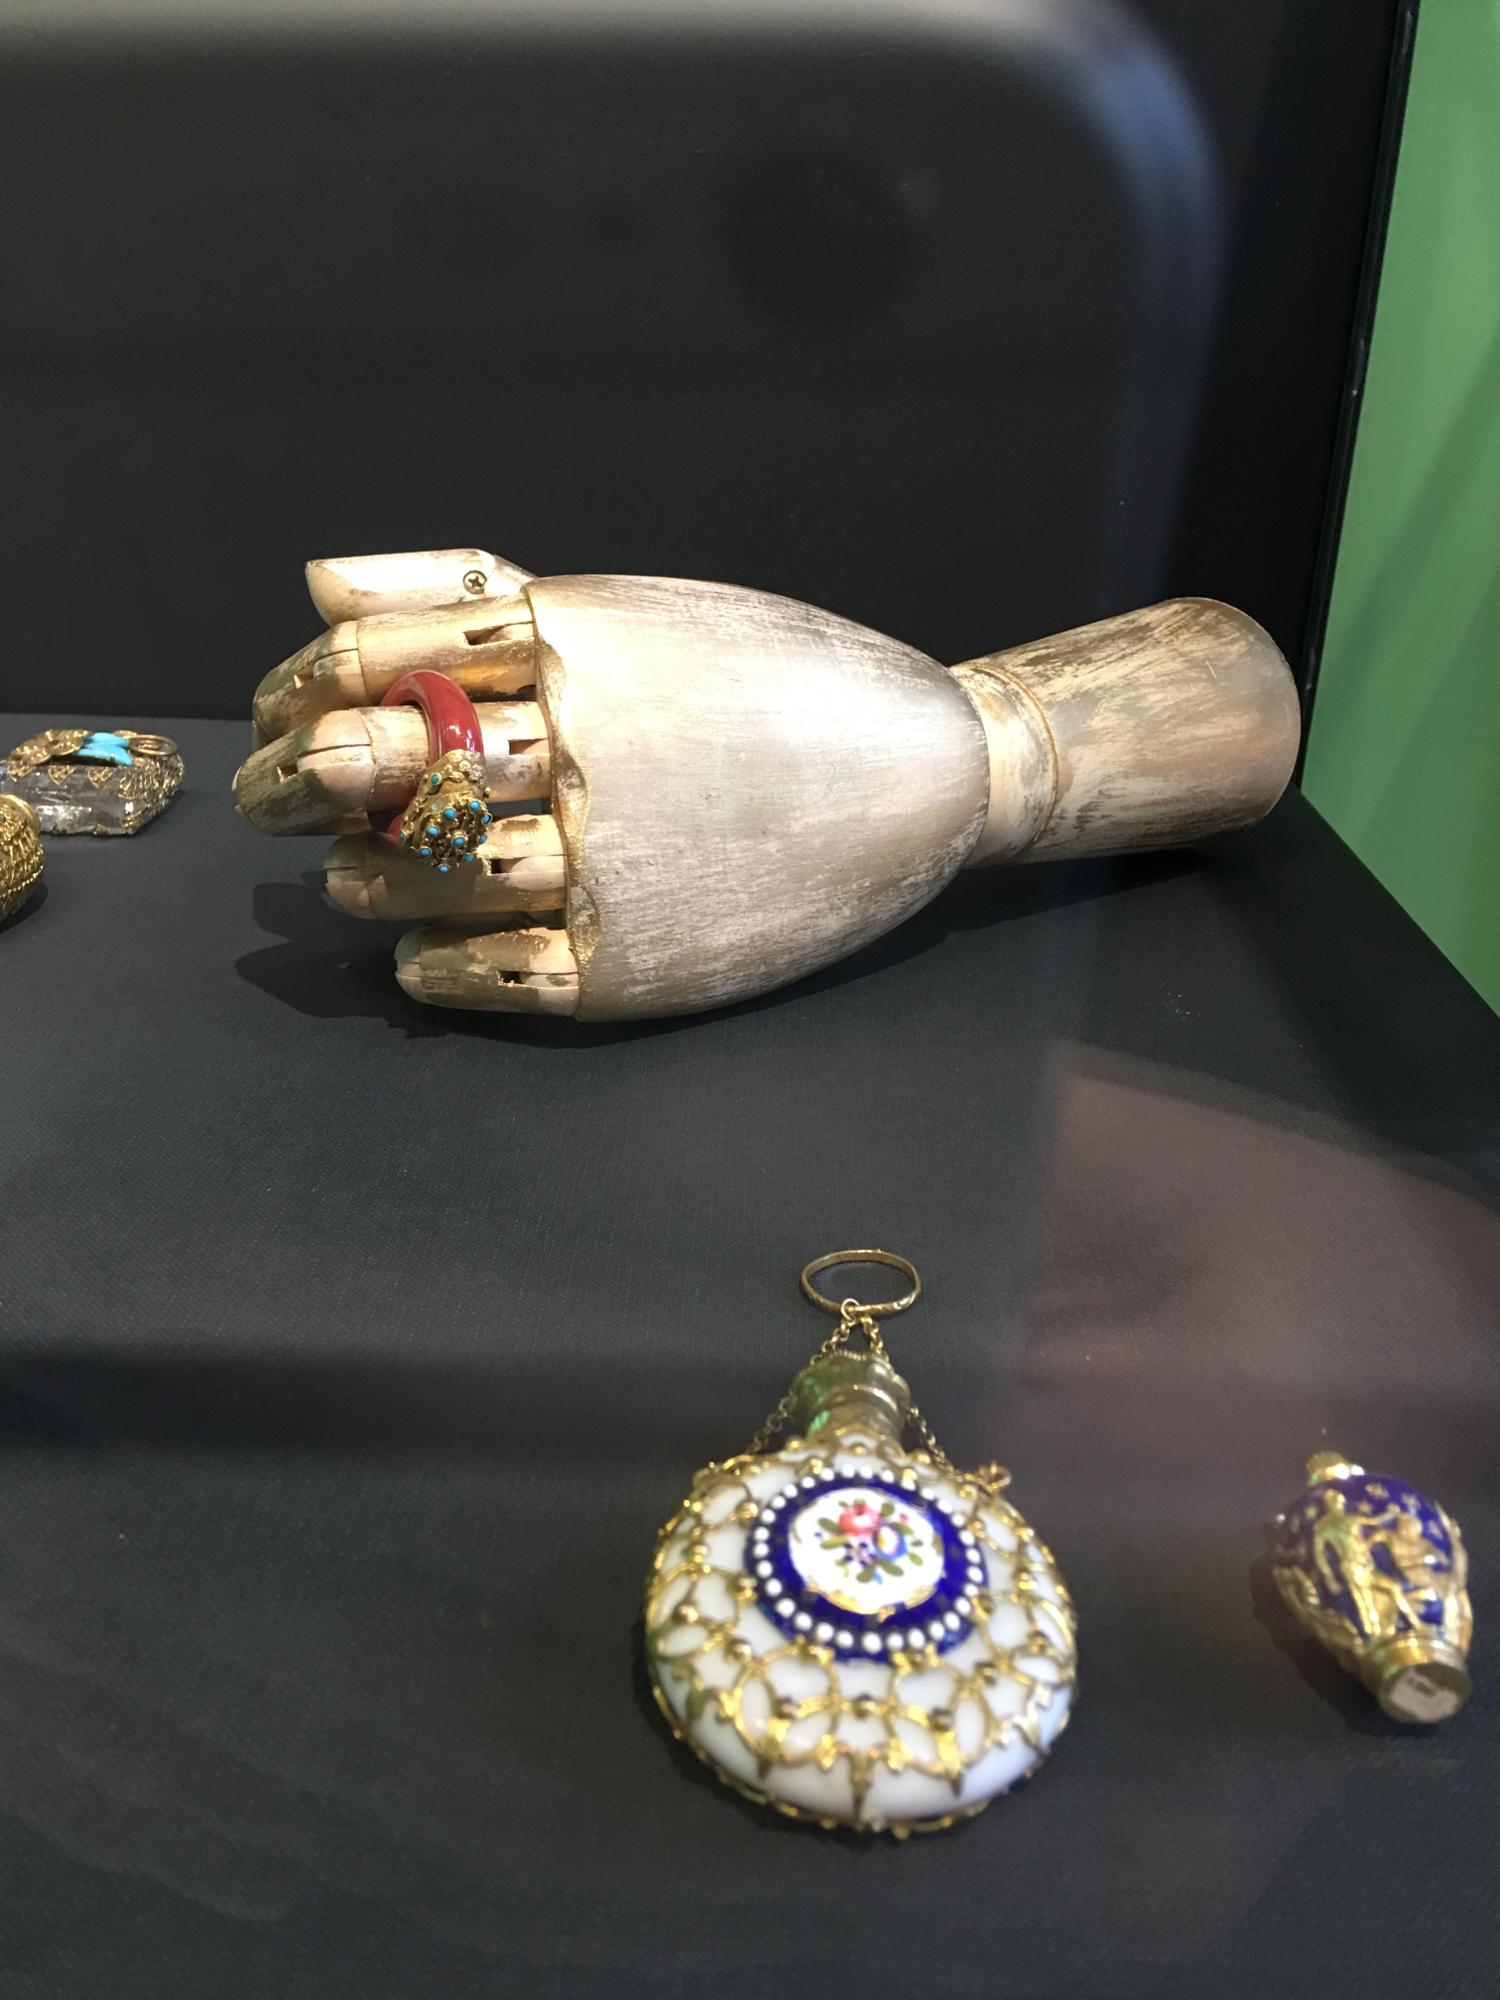 rocaille-blog-venezia-palazzo-mocenigo-cabinet-of-curiosities-collezione-storp-profumo-3